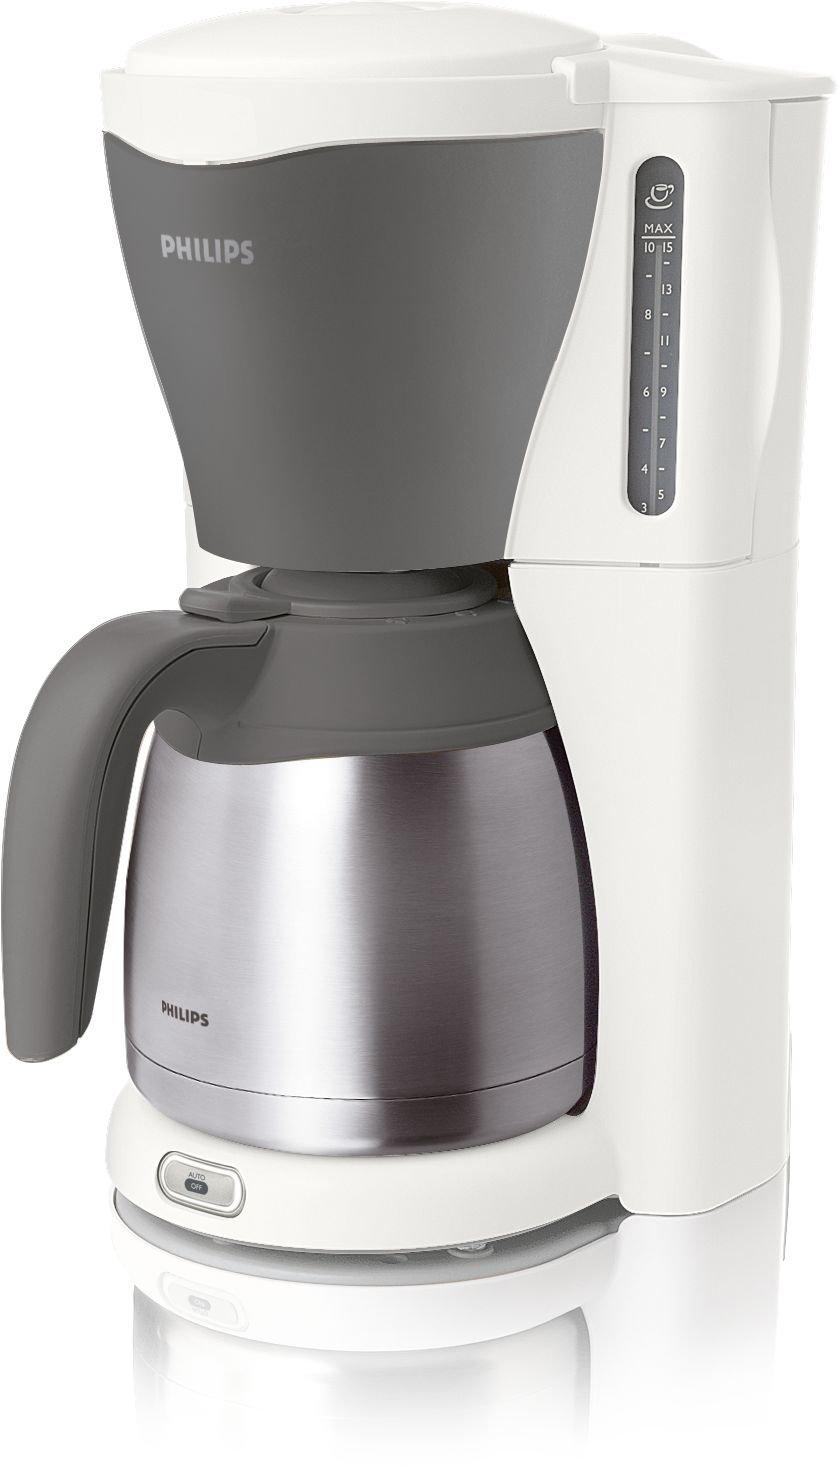 Philips Viva HD7544 - Cafetera (Independiente, Gris, Acero ...